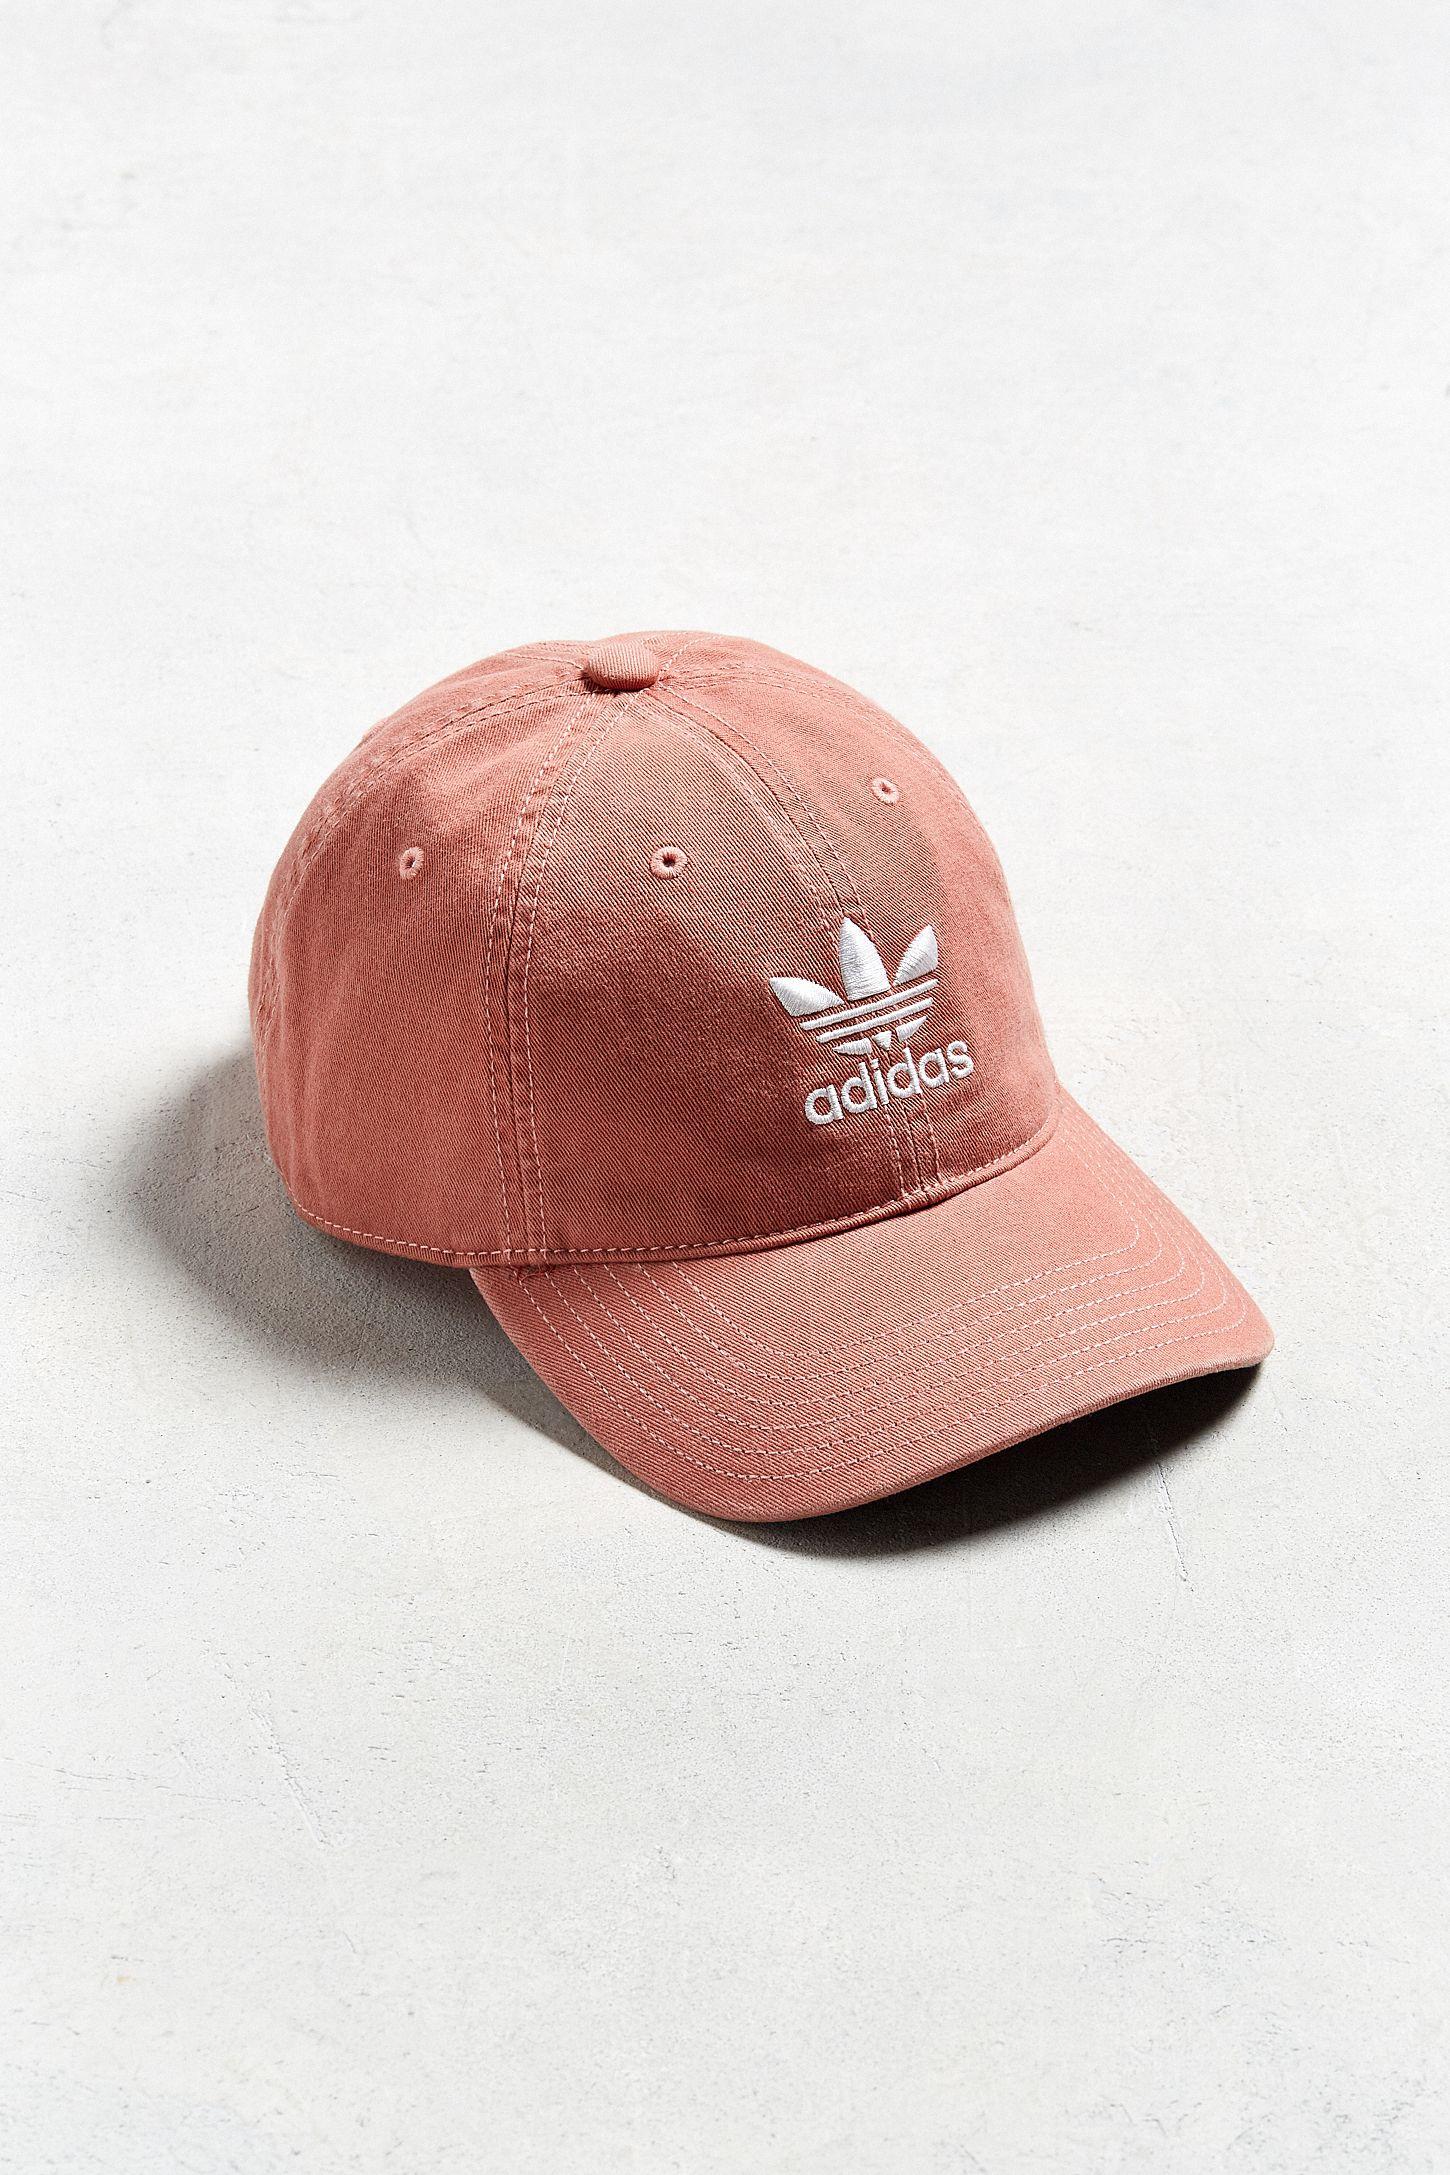 3c45b6a1ed3 adidas Originals Relaxed Baseball Hat